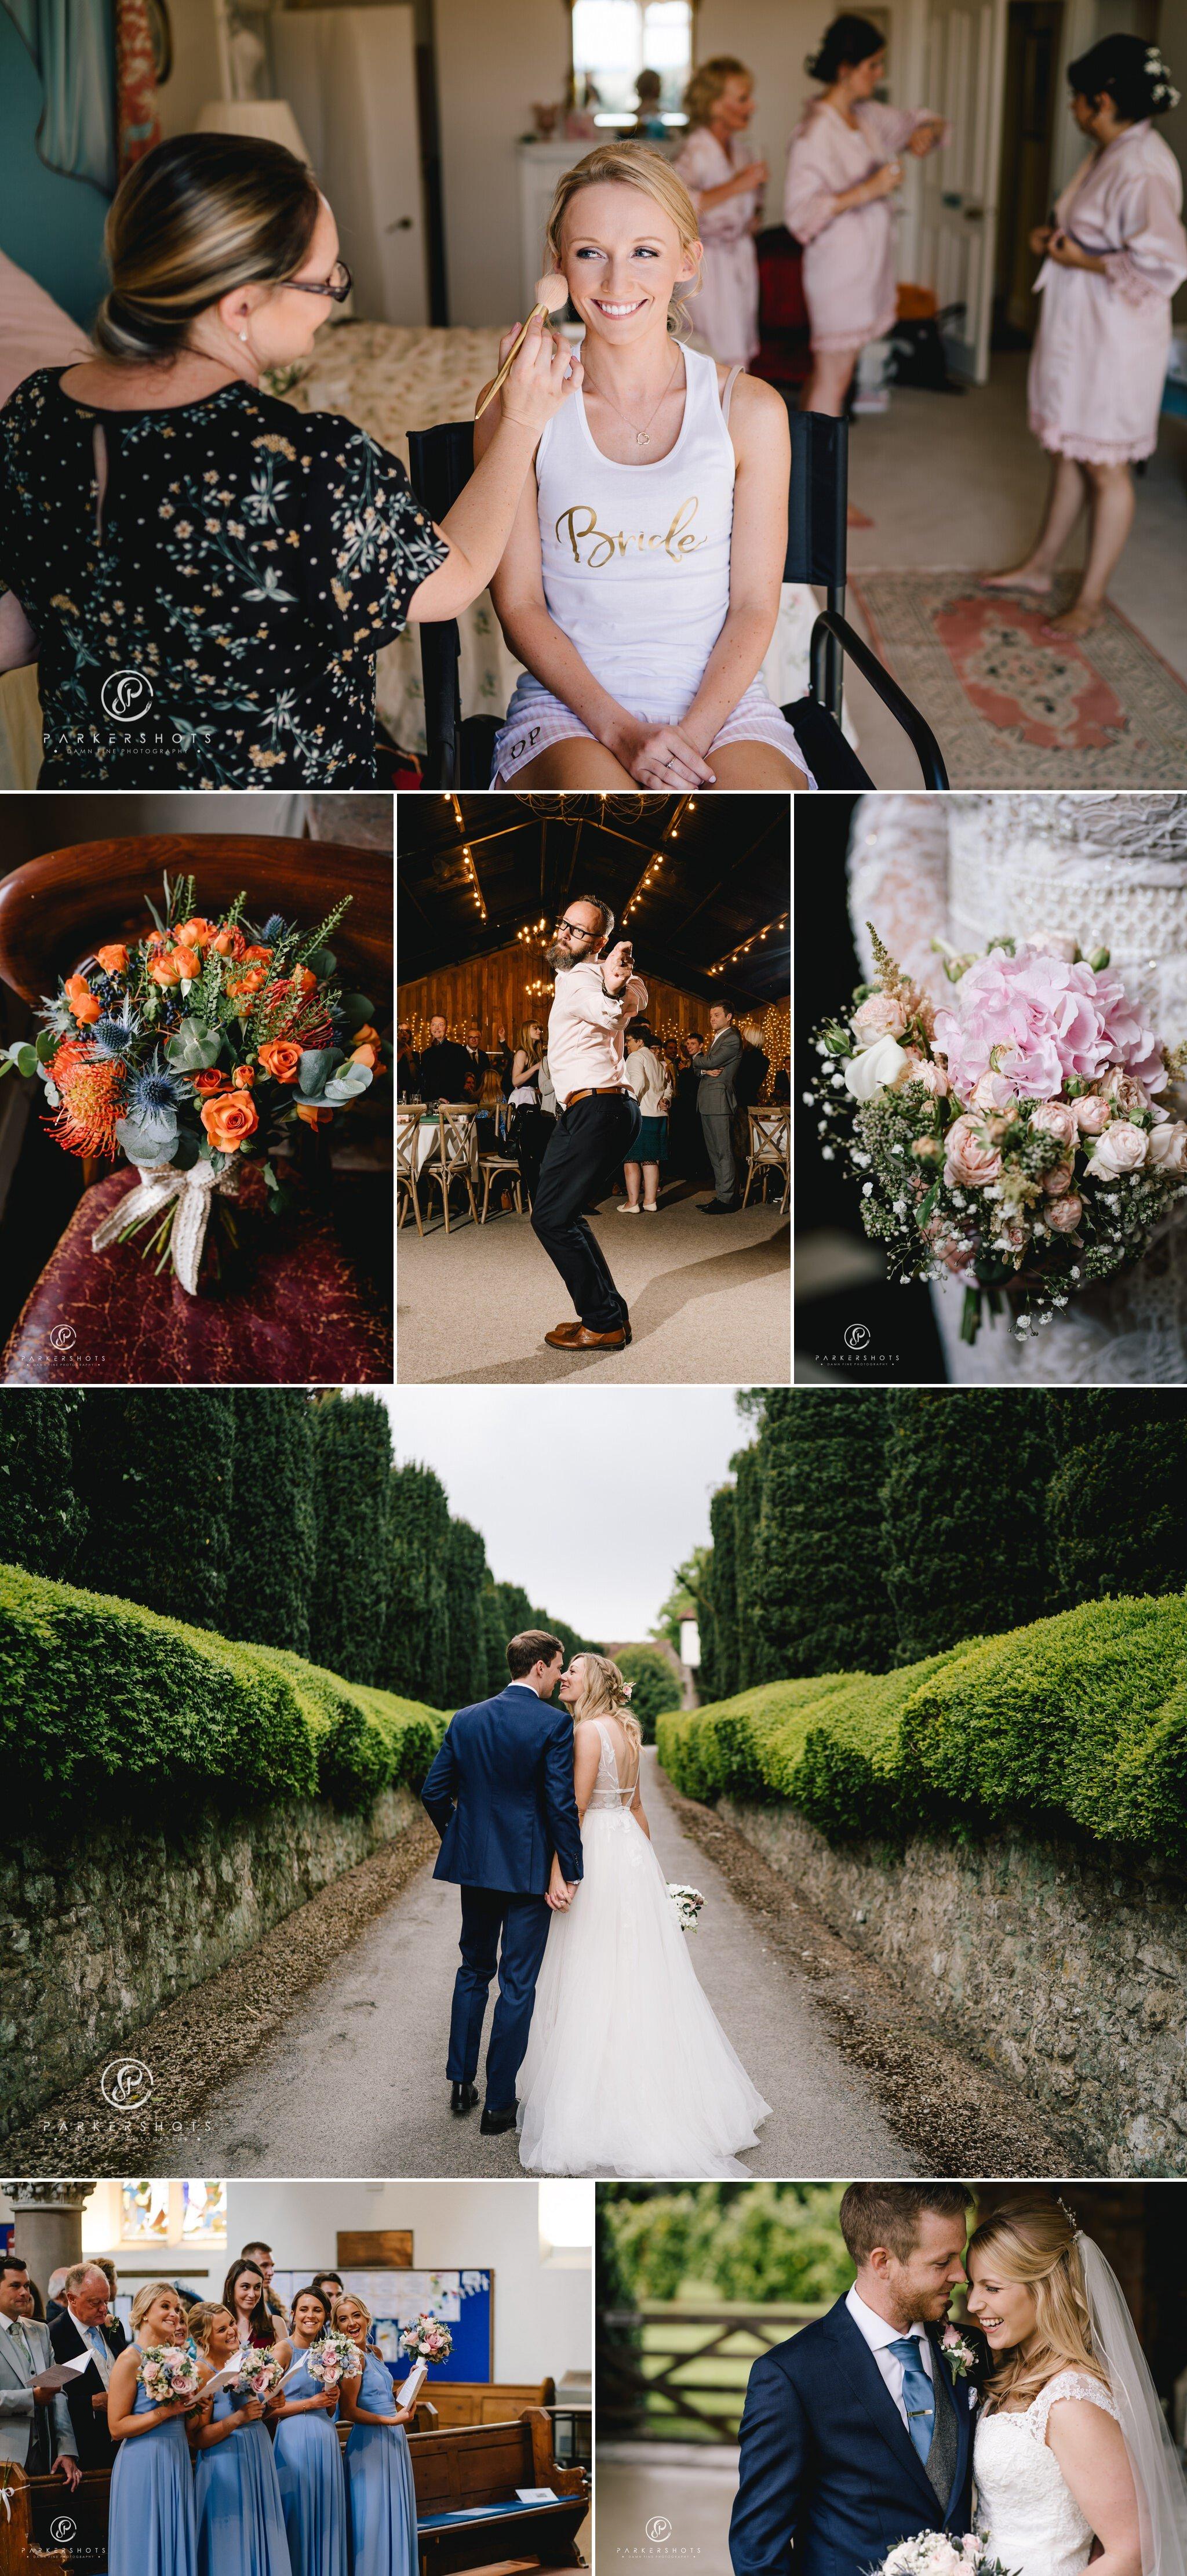 Best of Tunbridge Wells Wedding Photographers 2019